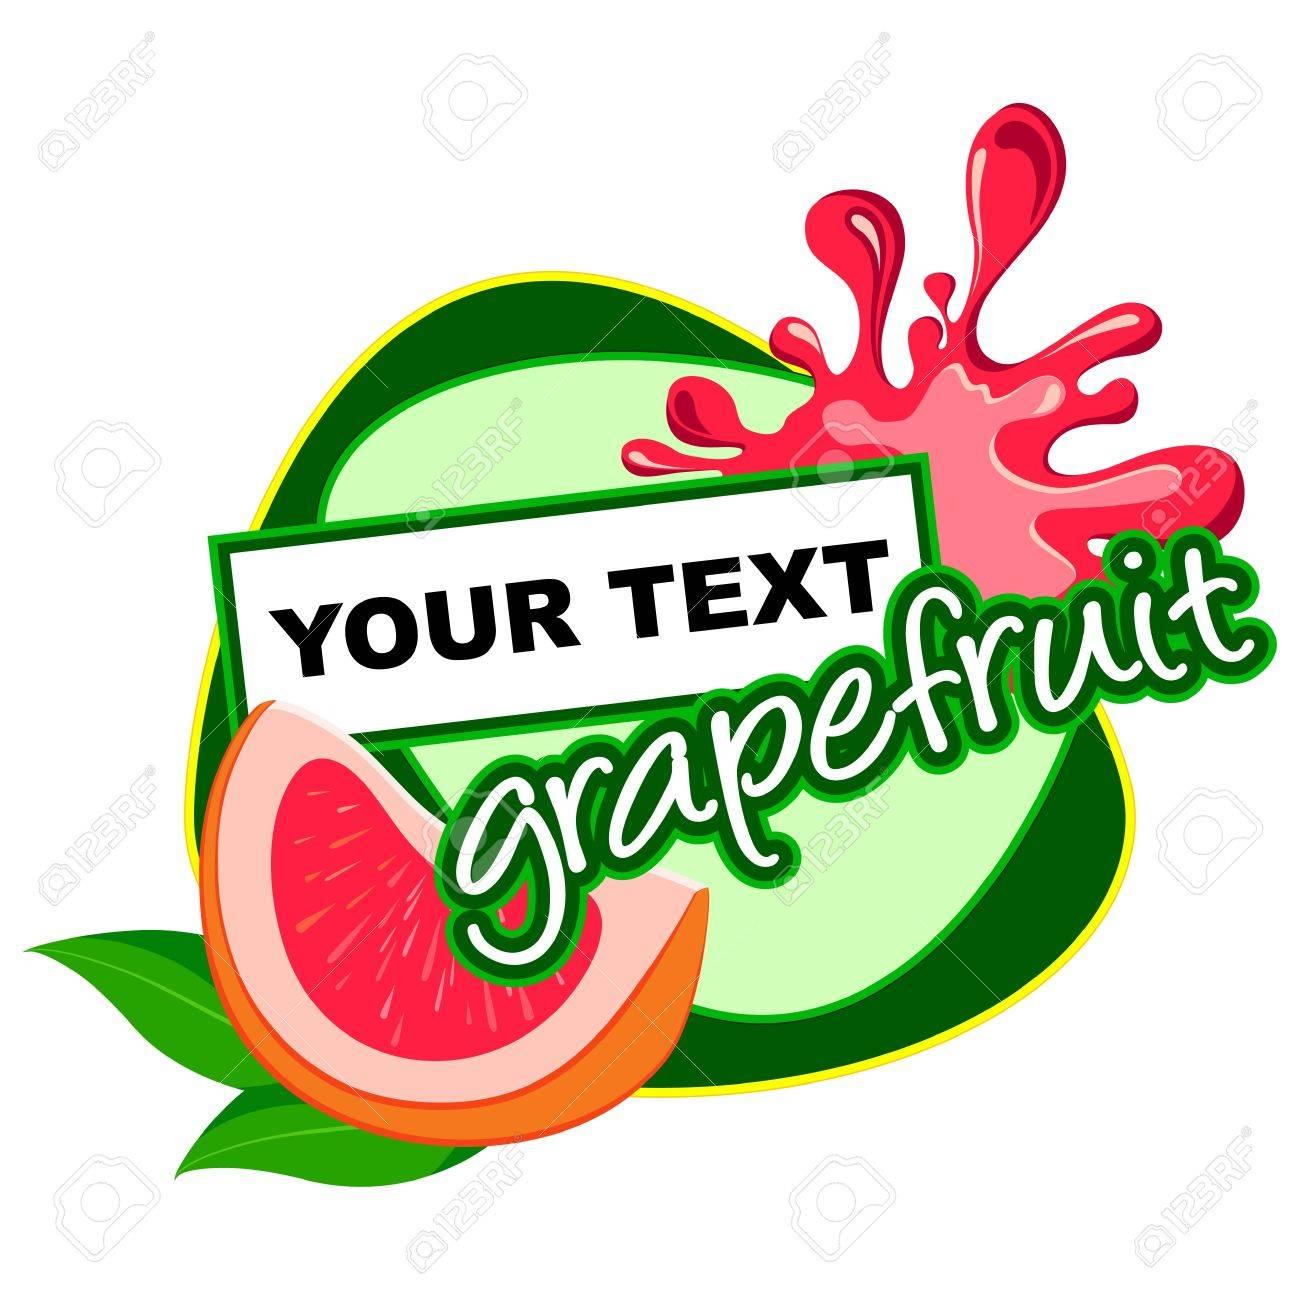 Grapefruit label desidn Stock Vector - 13932184